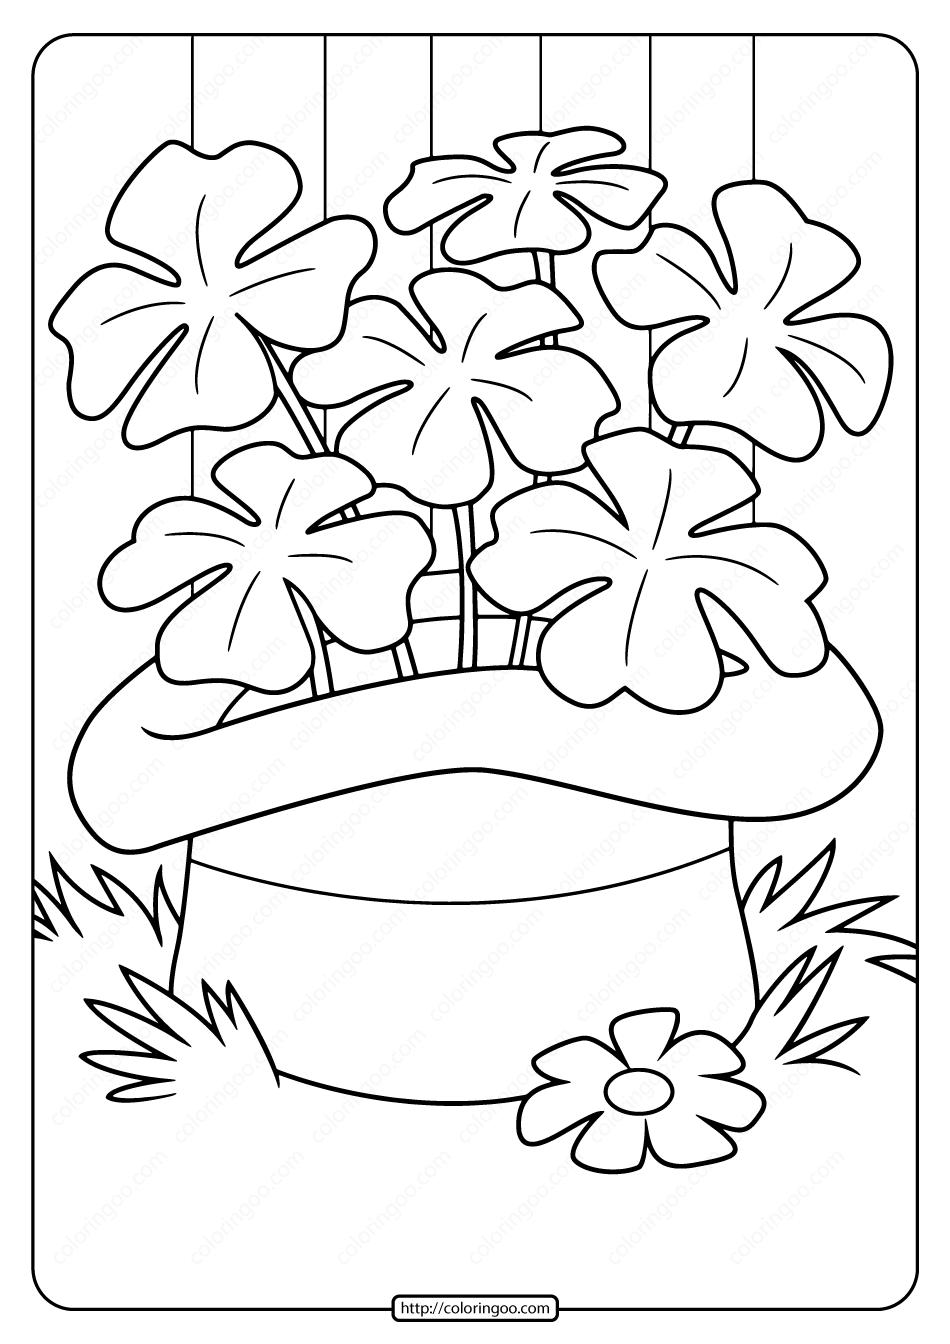 Free Printable Saint Patrick's Day Pdf Coloring Page